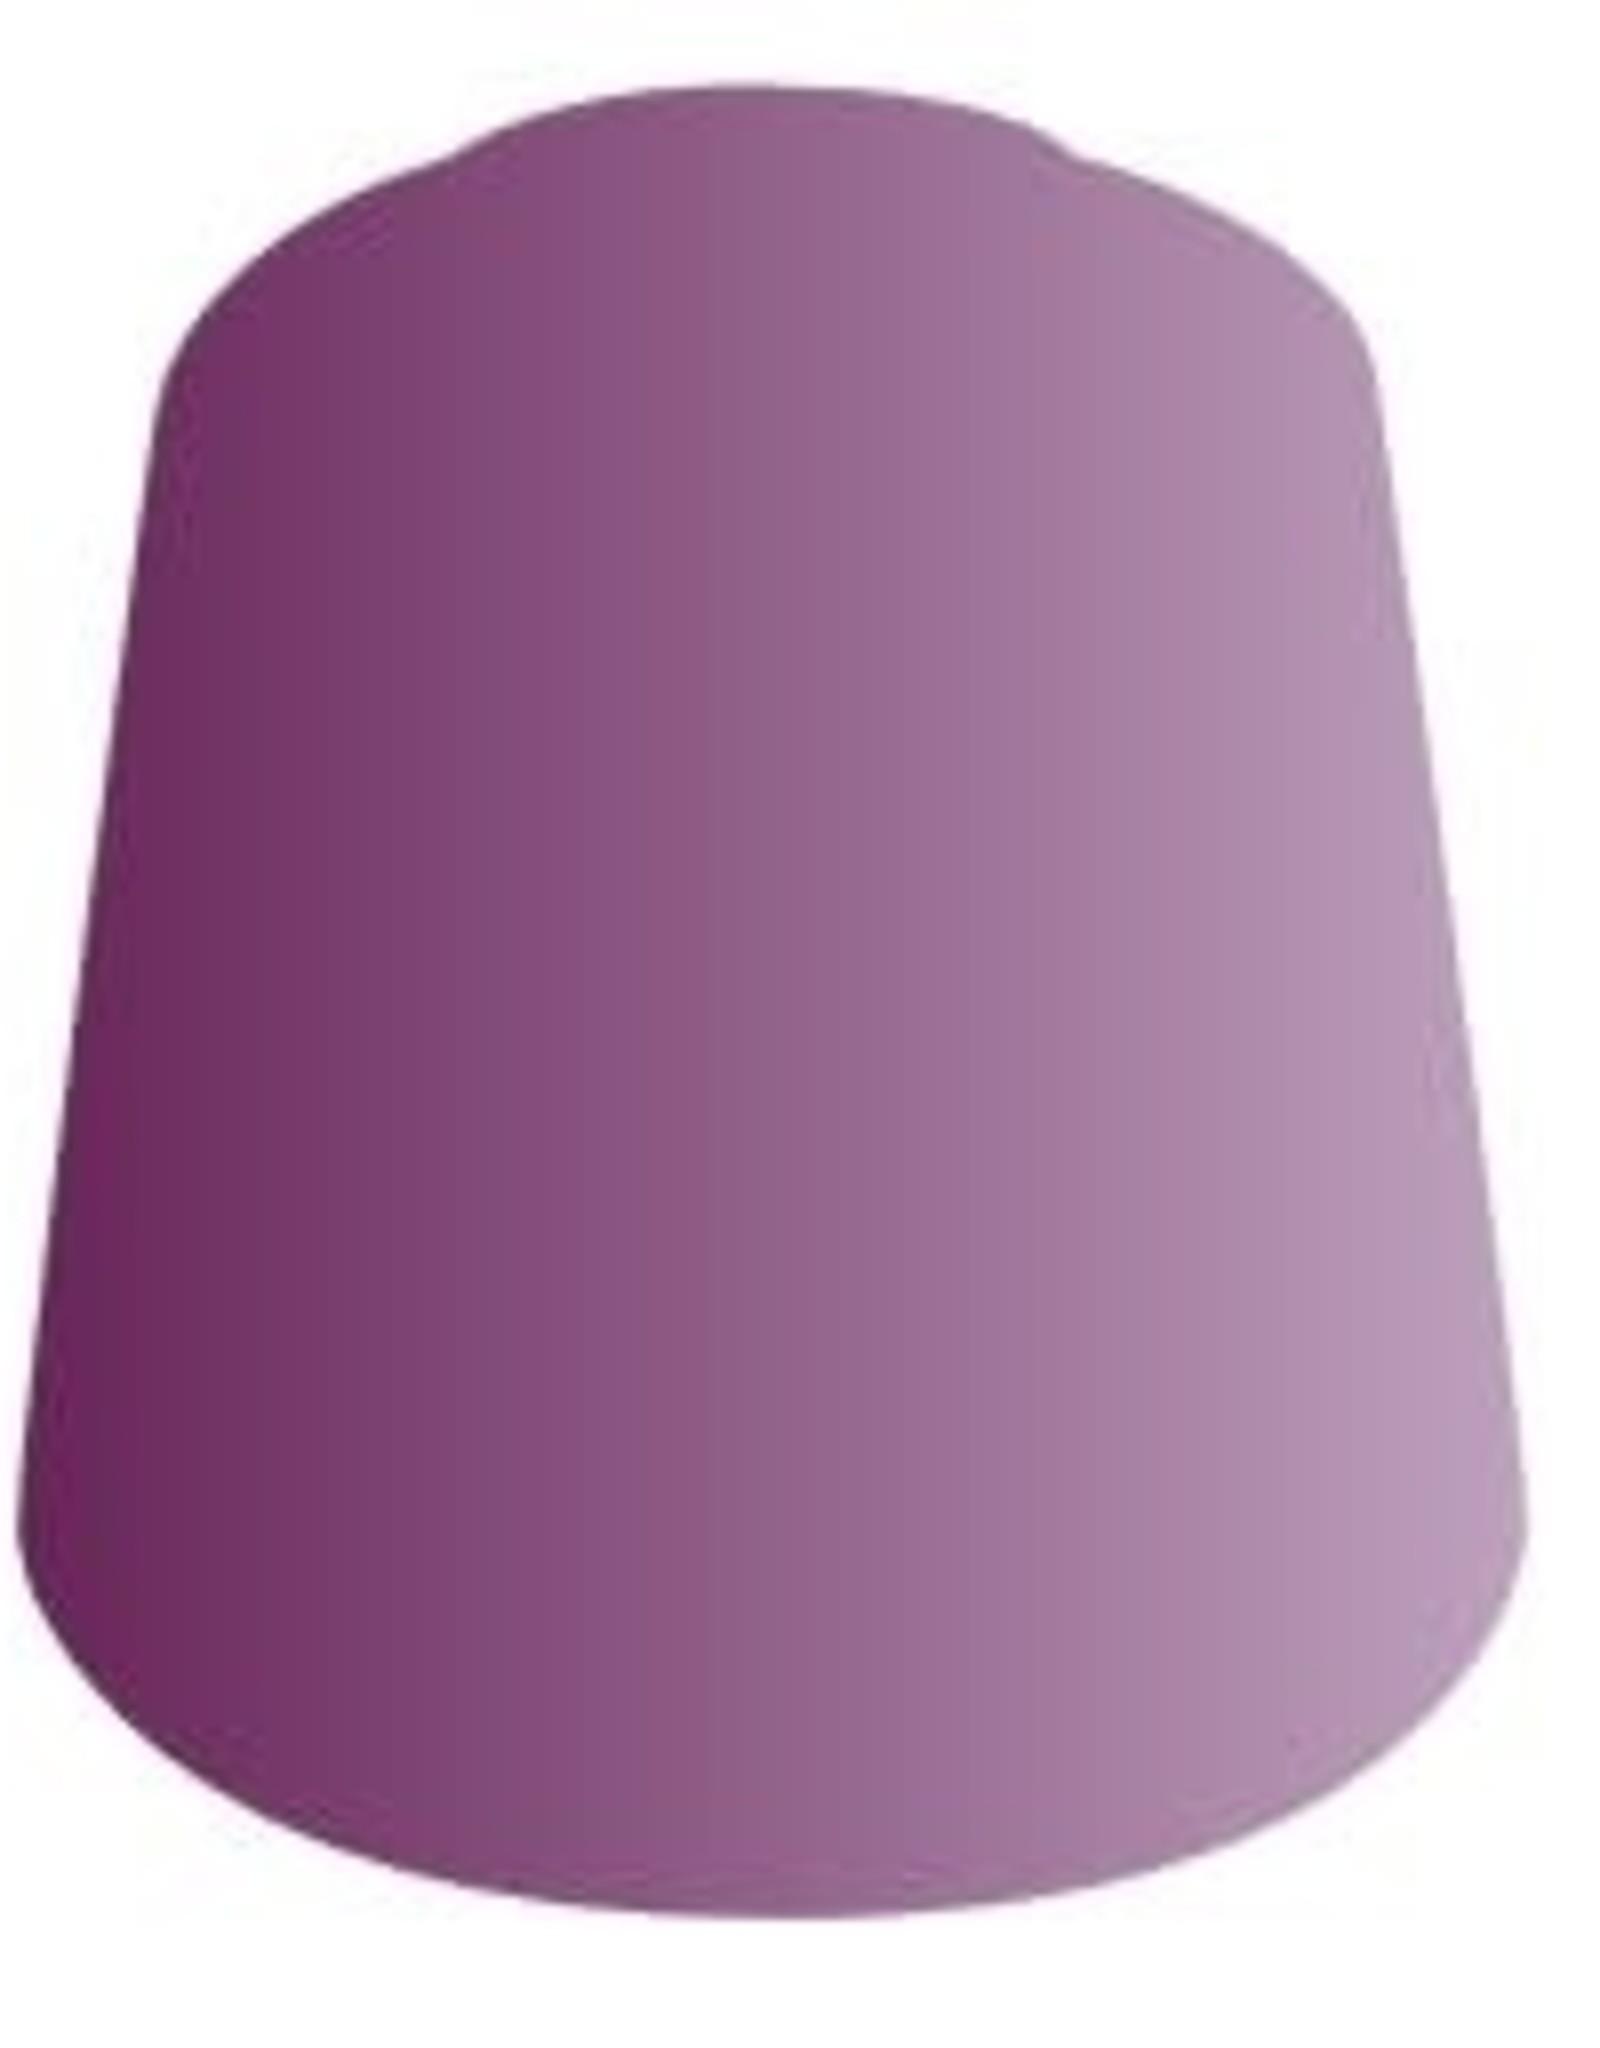 Games Workshop Contrast Magos Purple